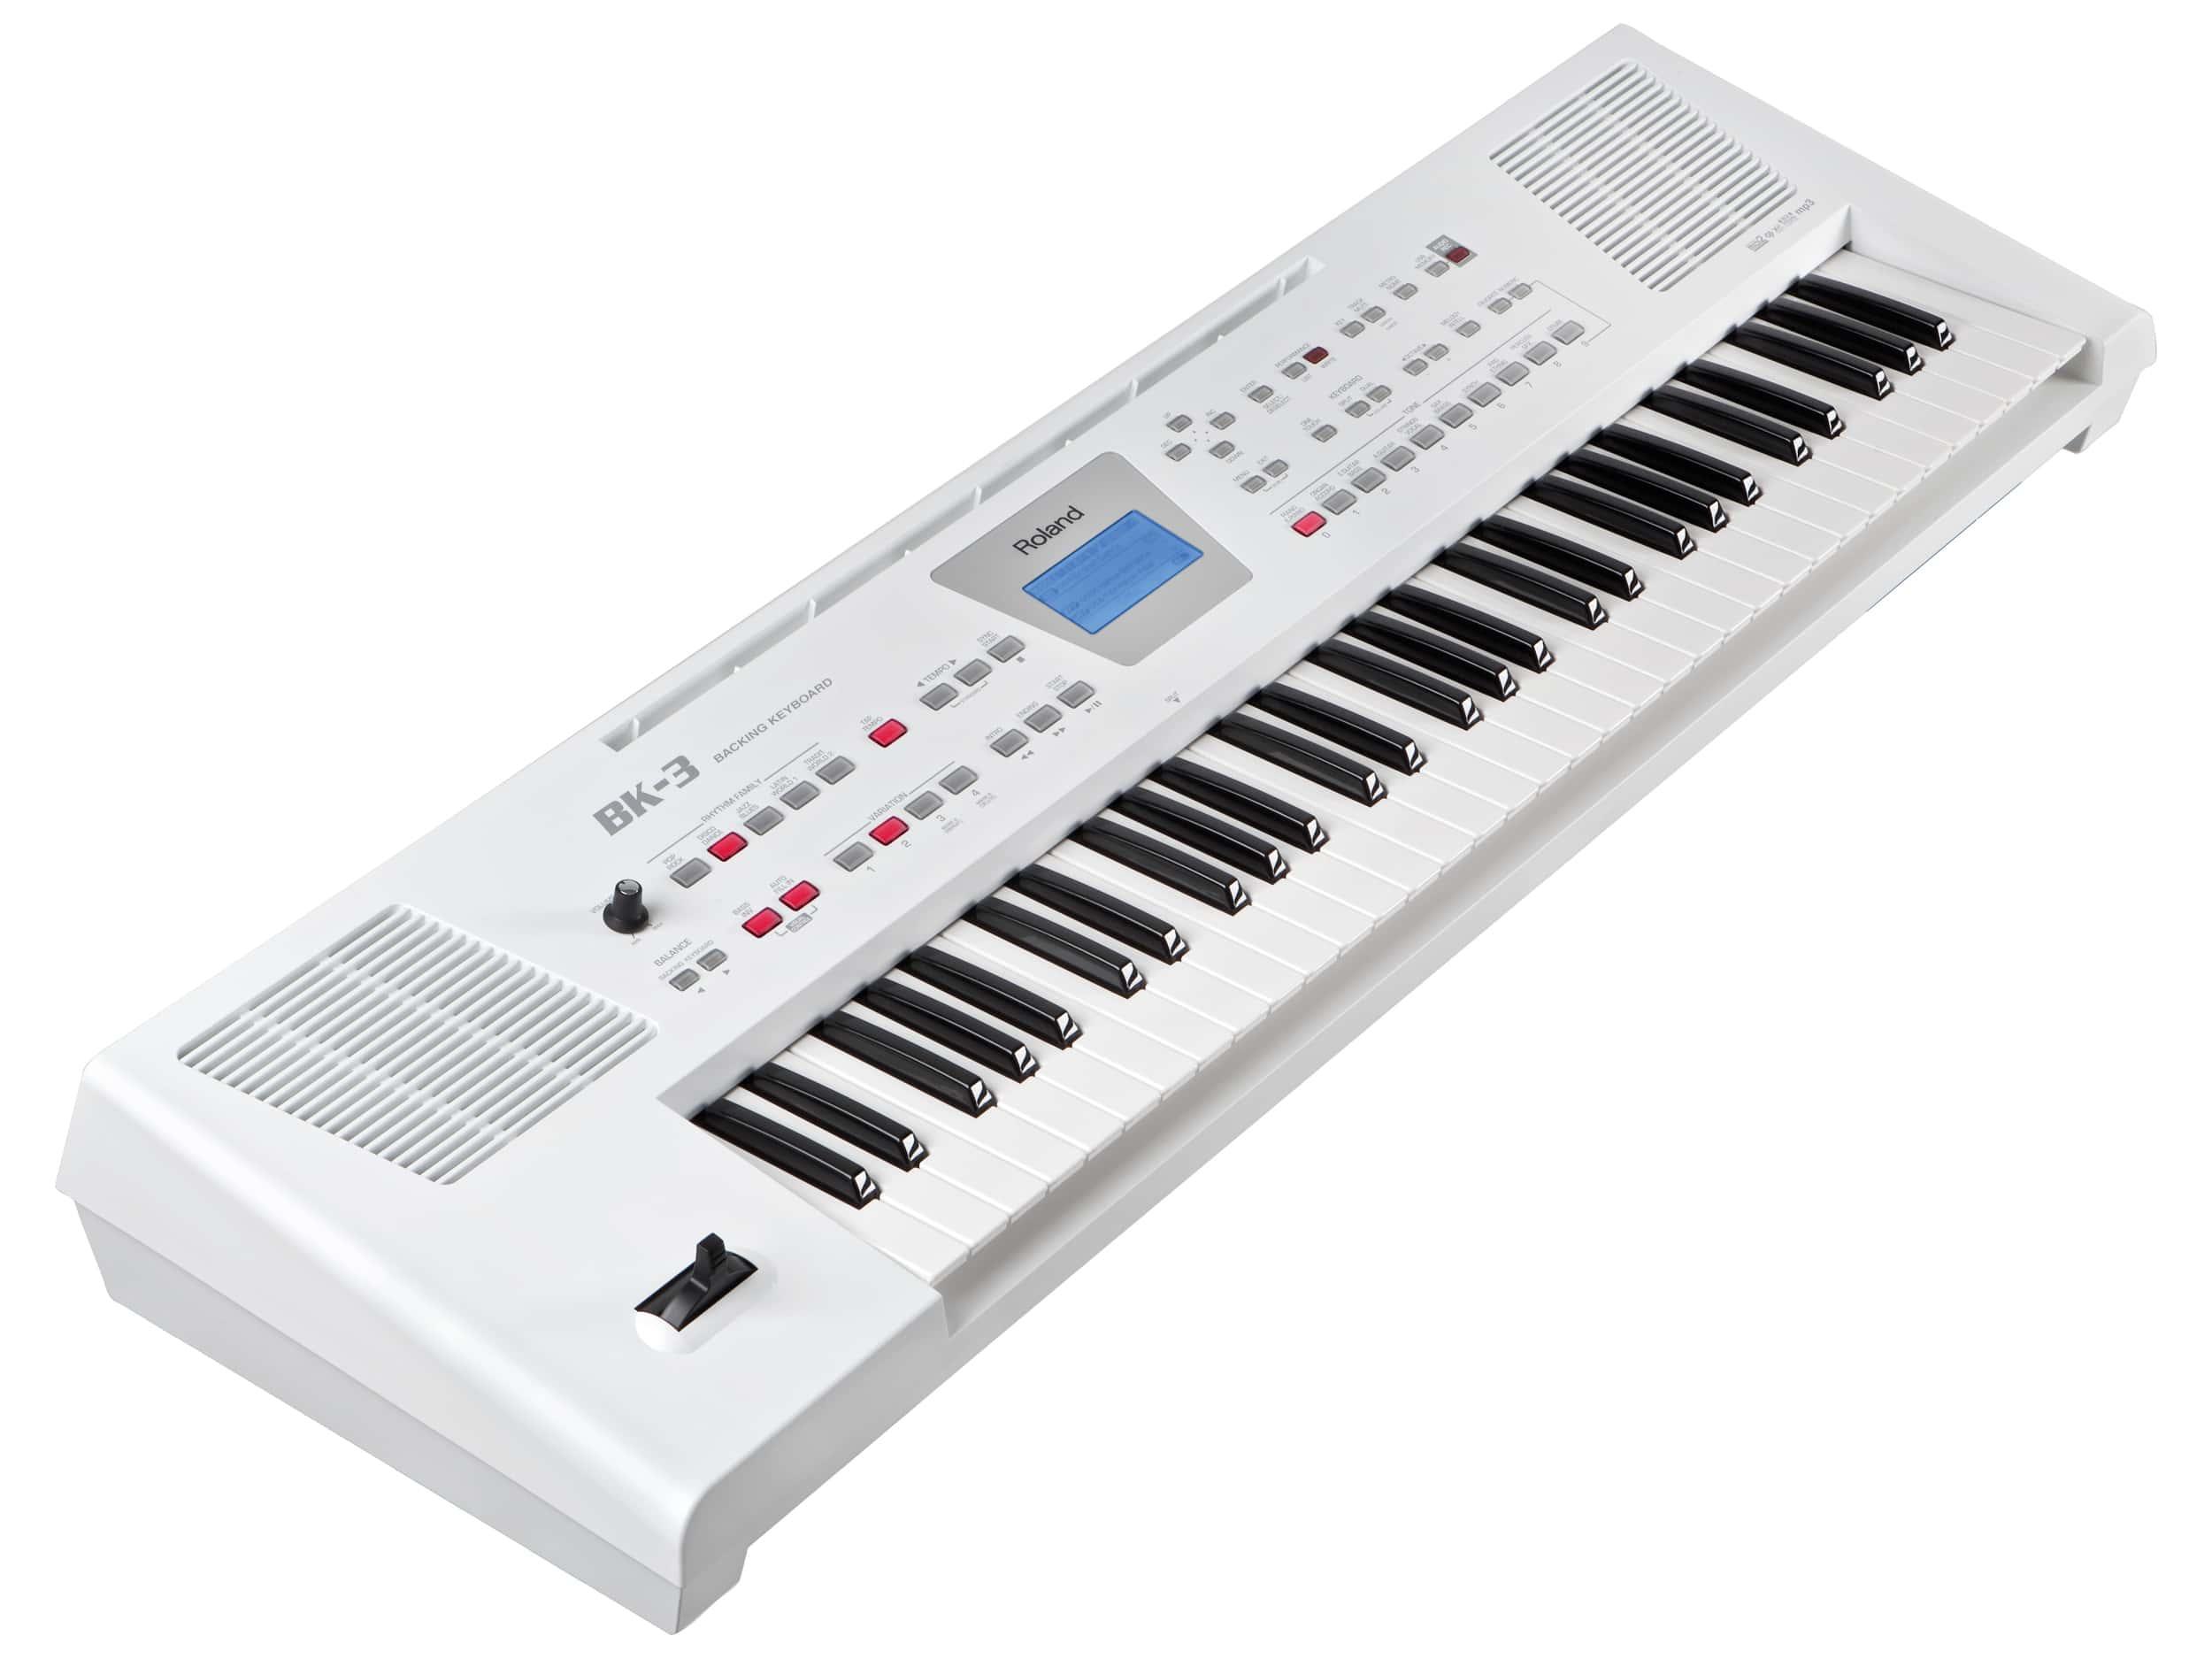 Roland digital piano f-1100 master service manual